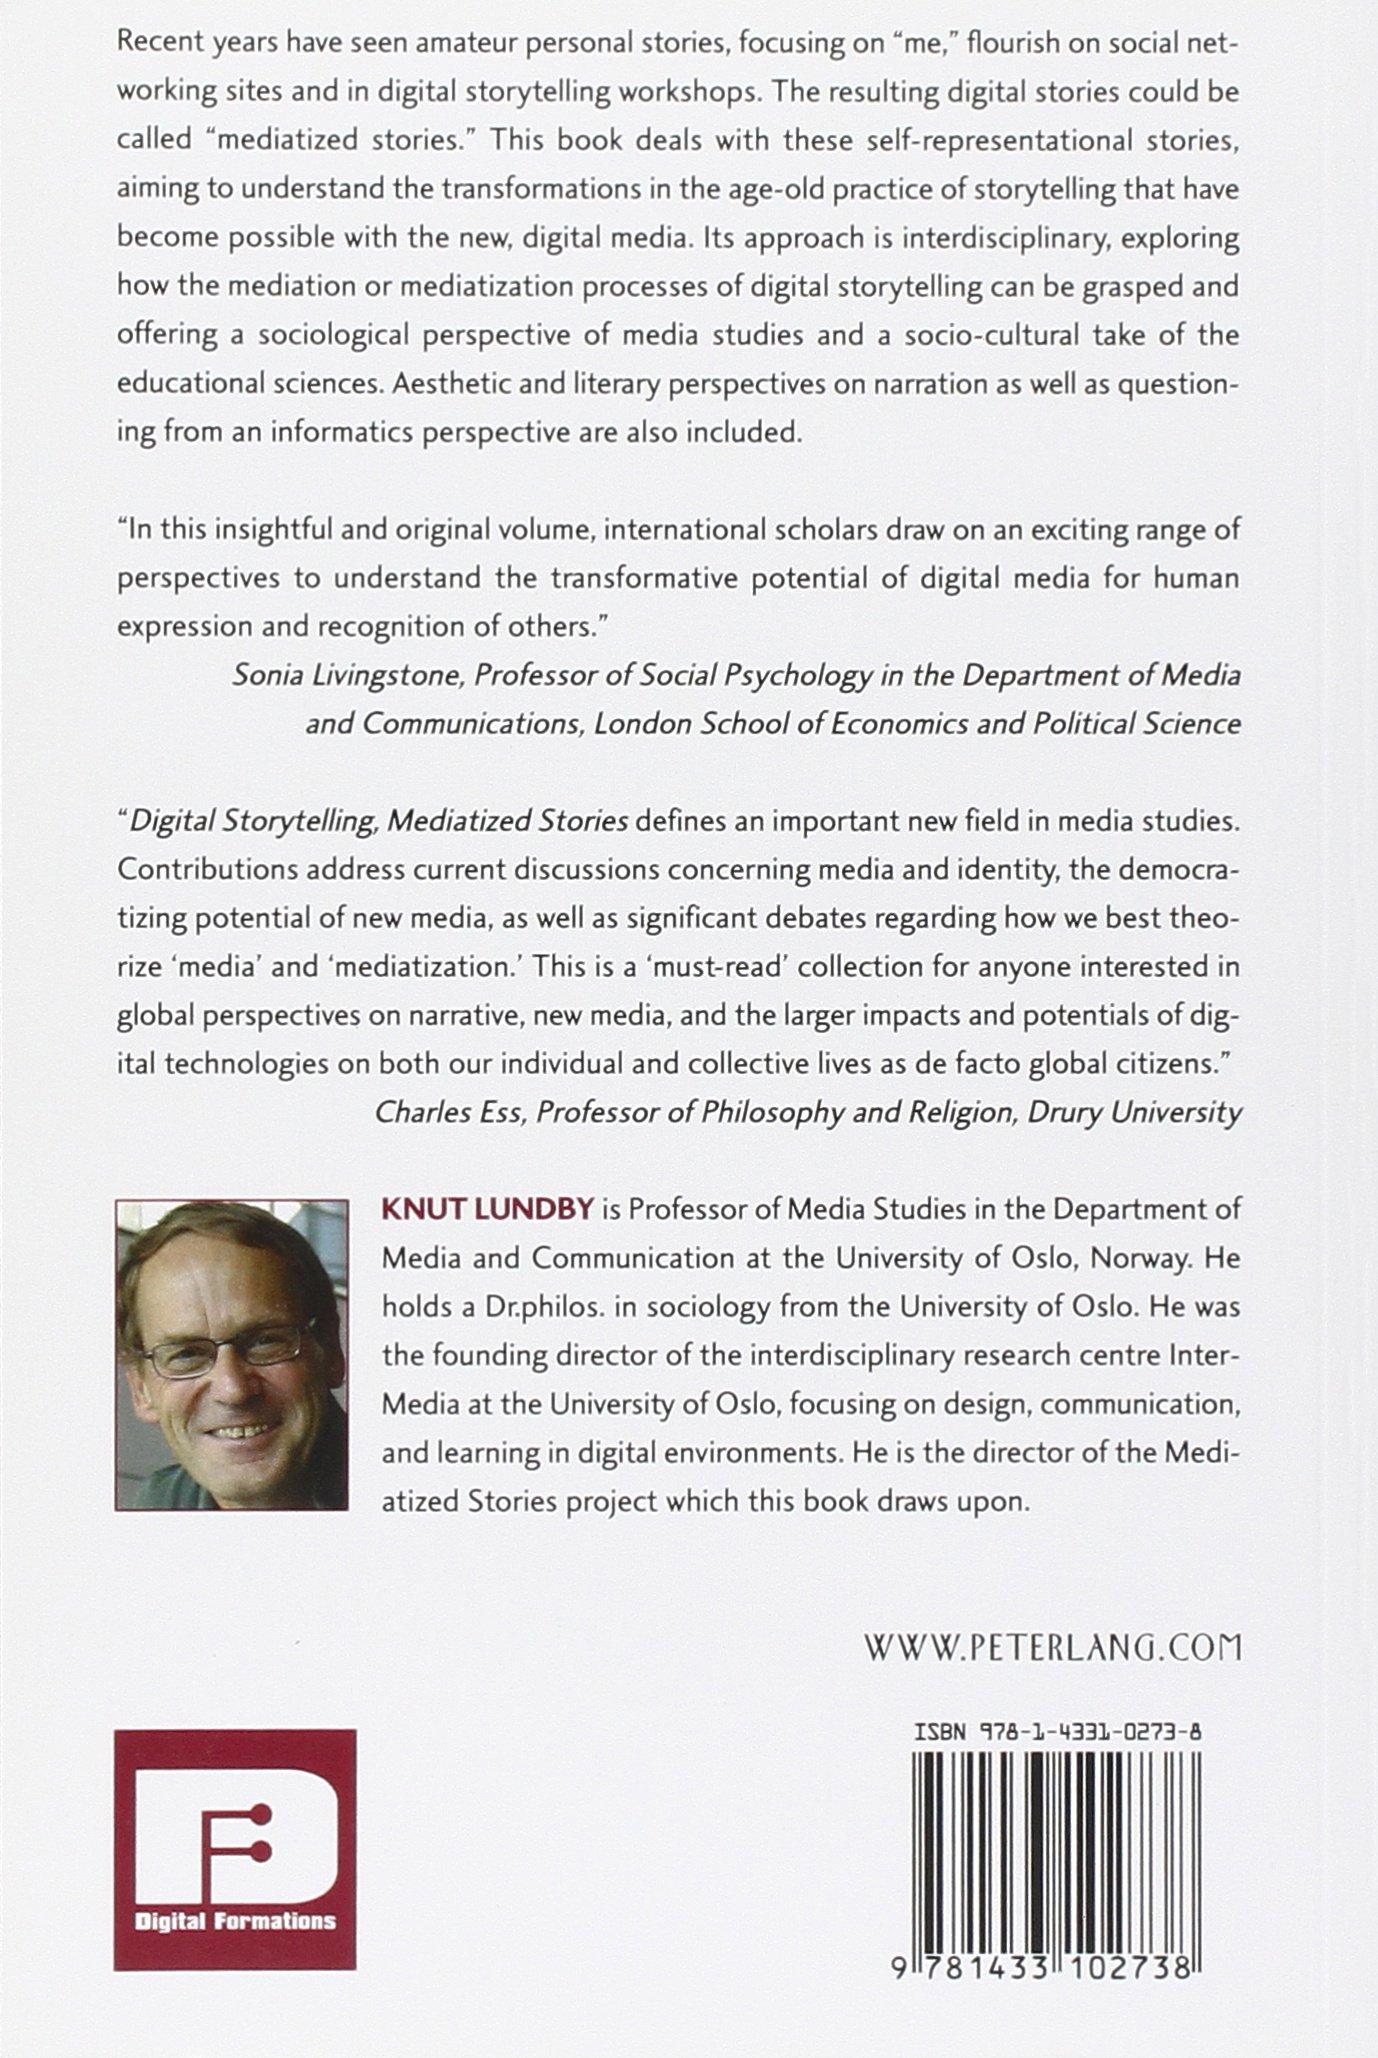 Digital Storytelling, Mediatized Stories (Digital Formations) by Peter Lang Publishing